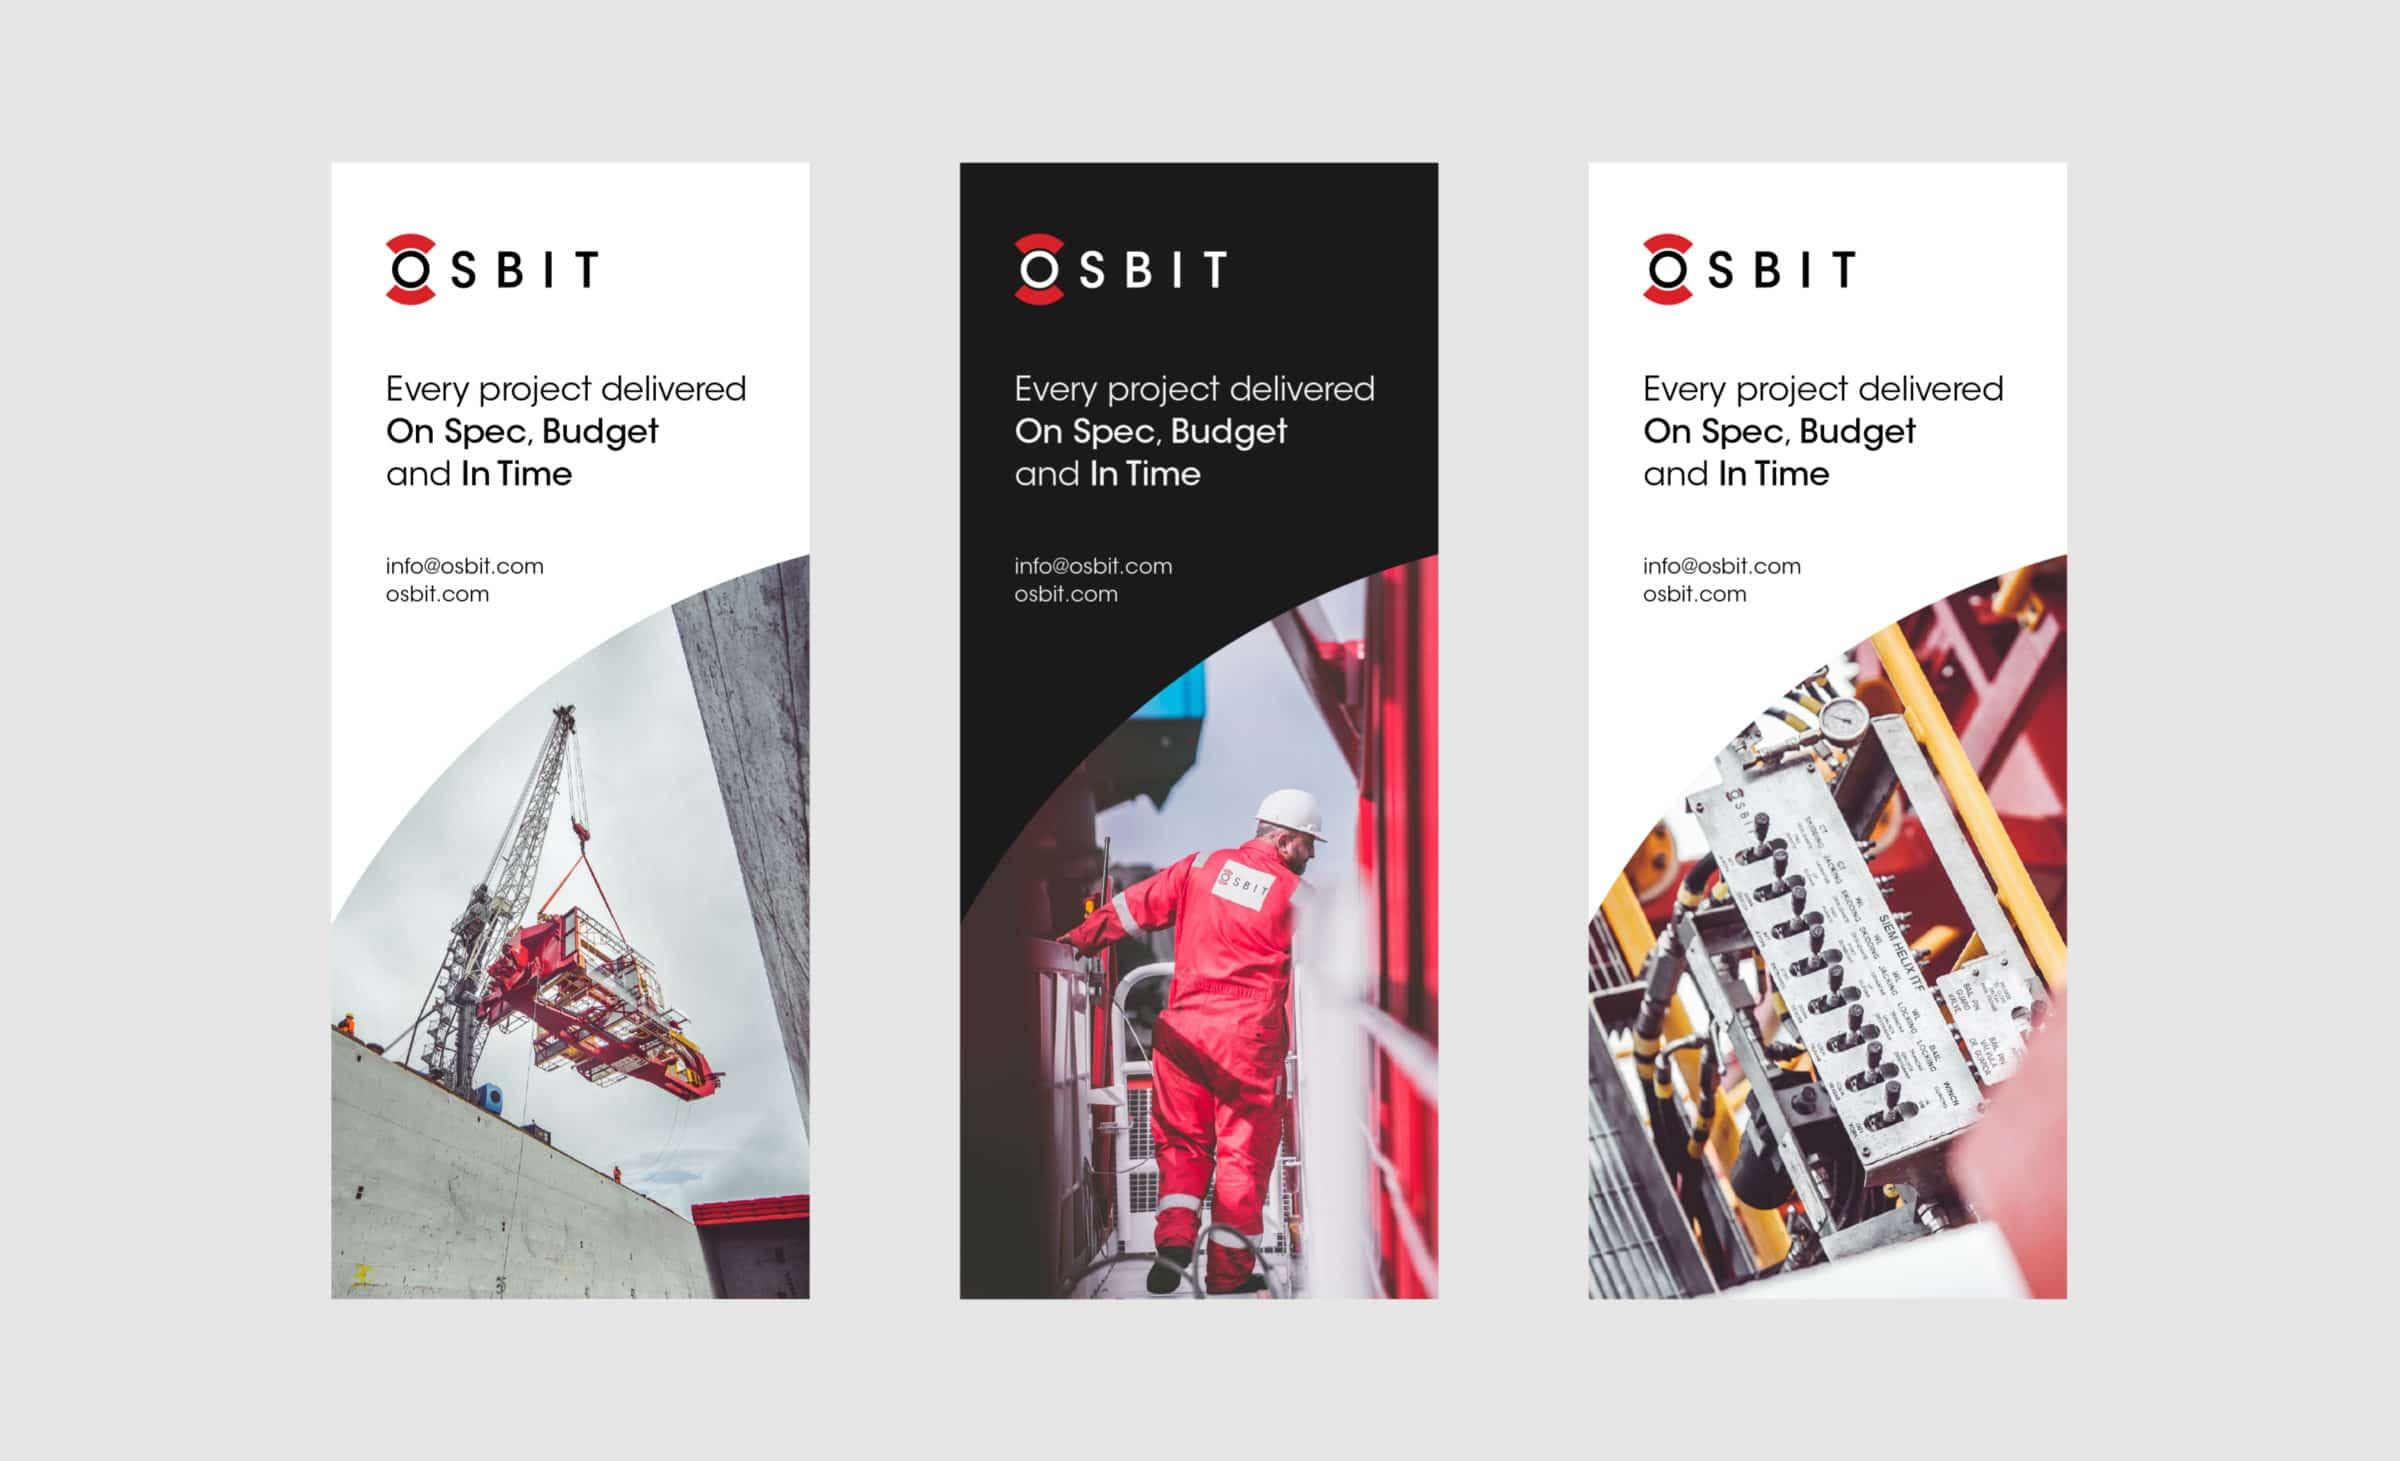 Exhibition design for OSBIT